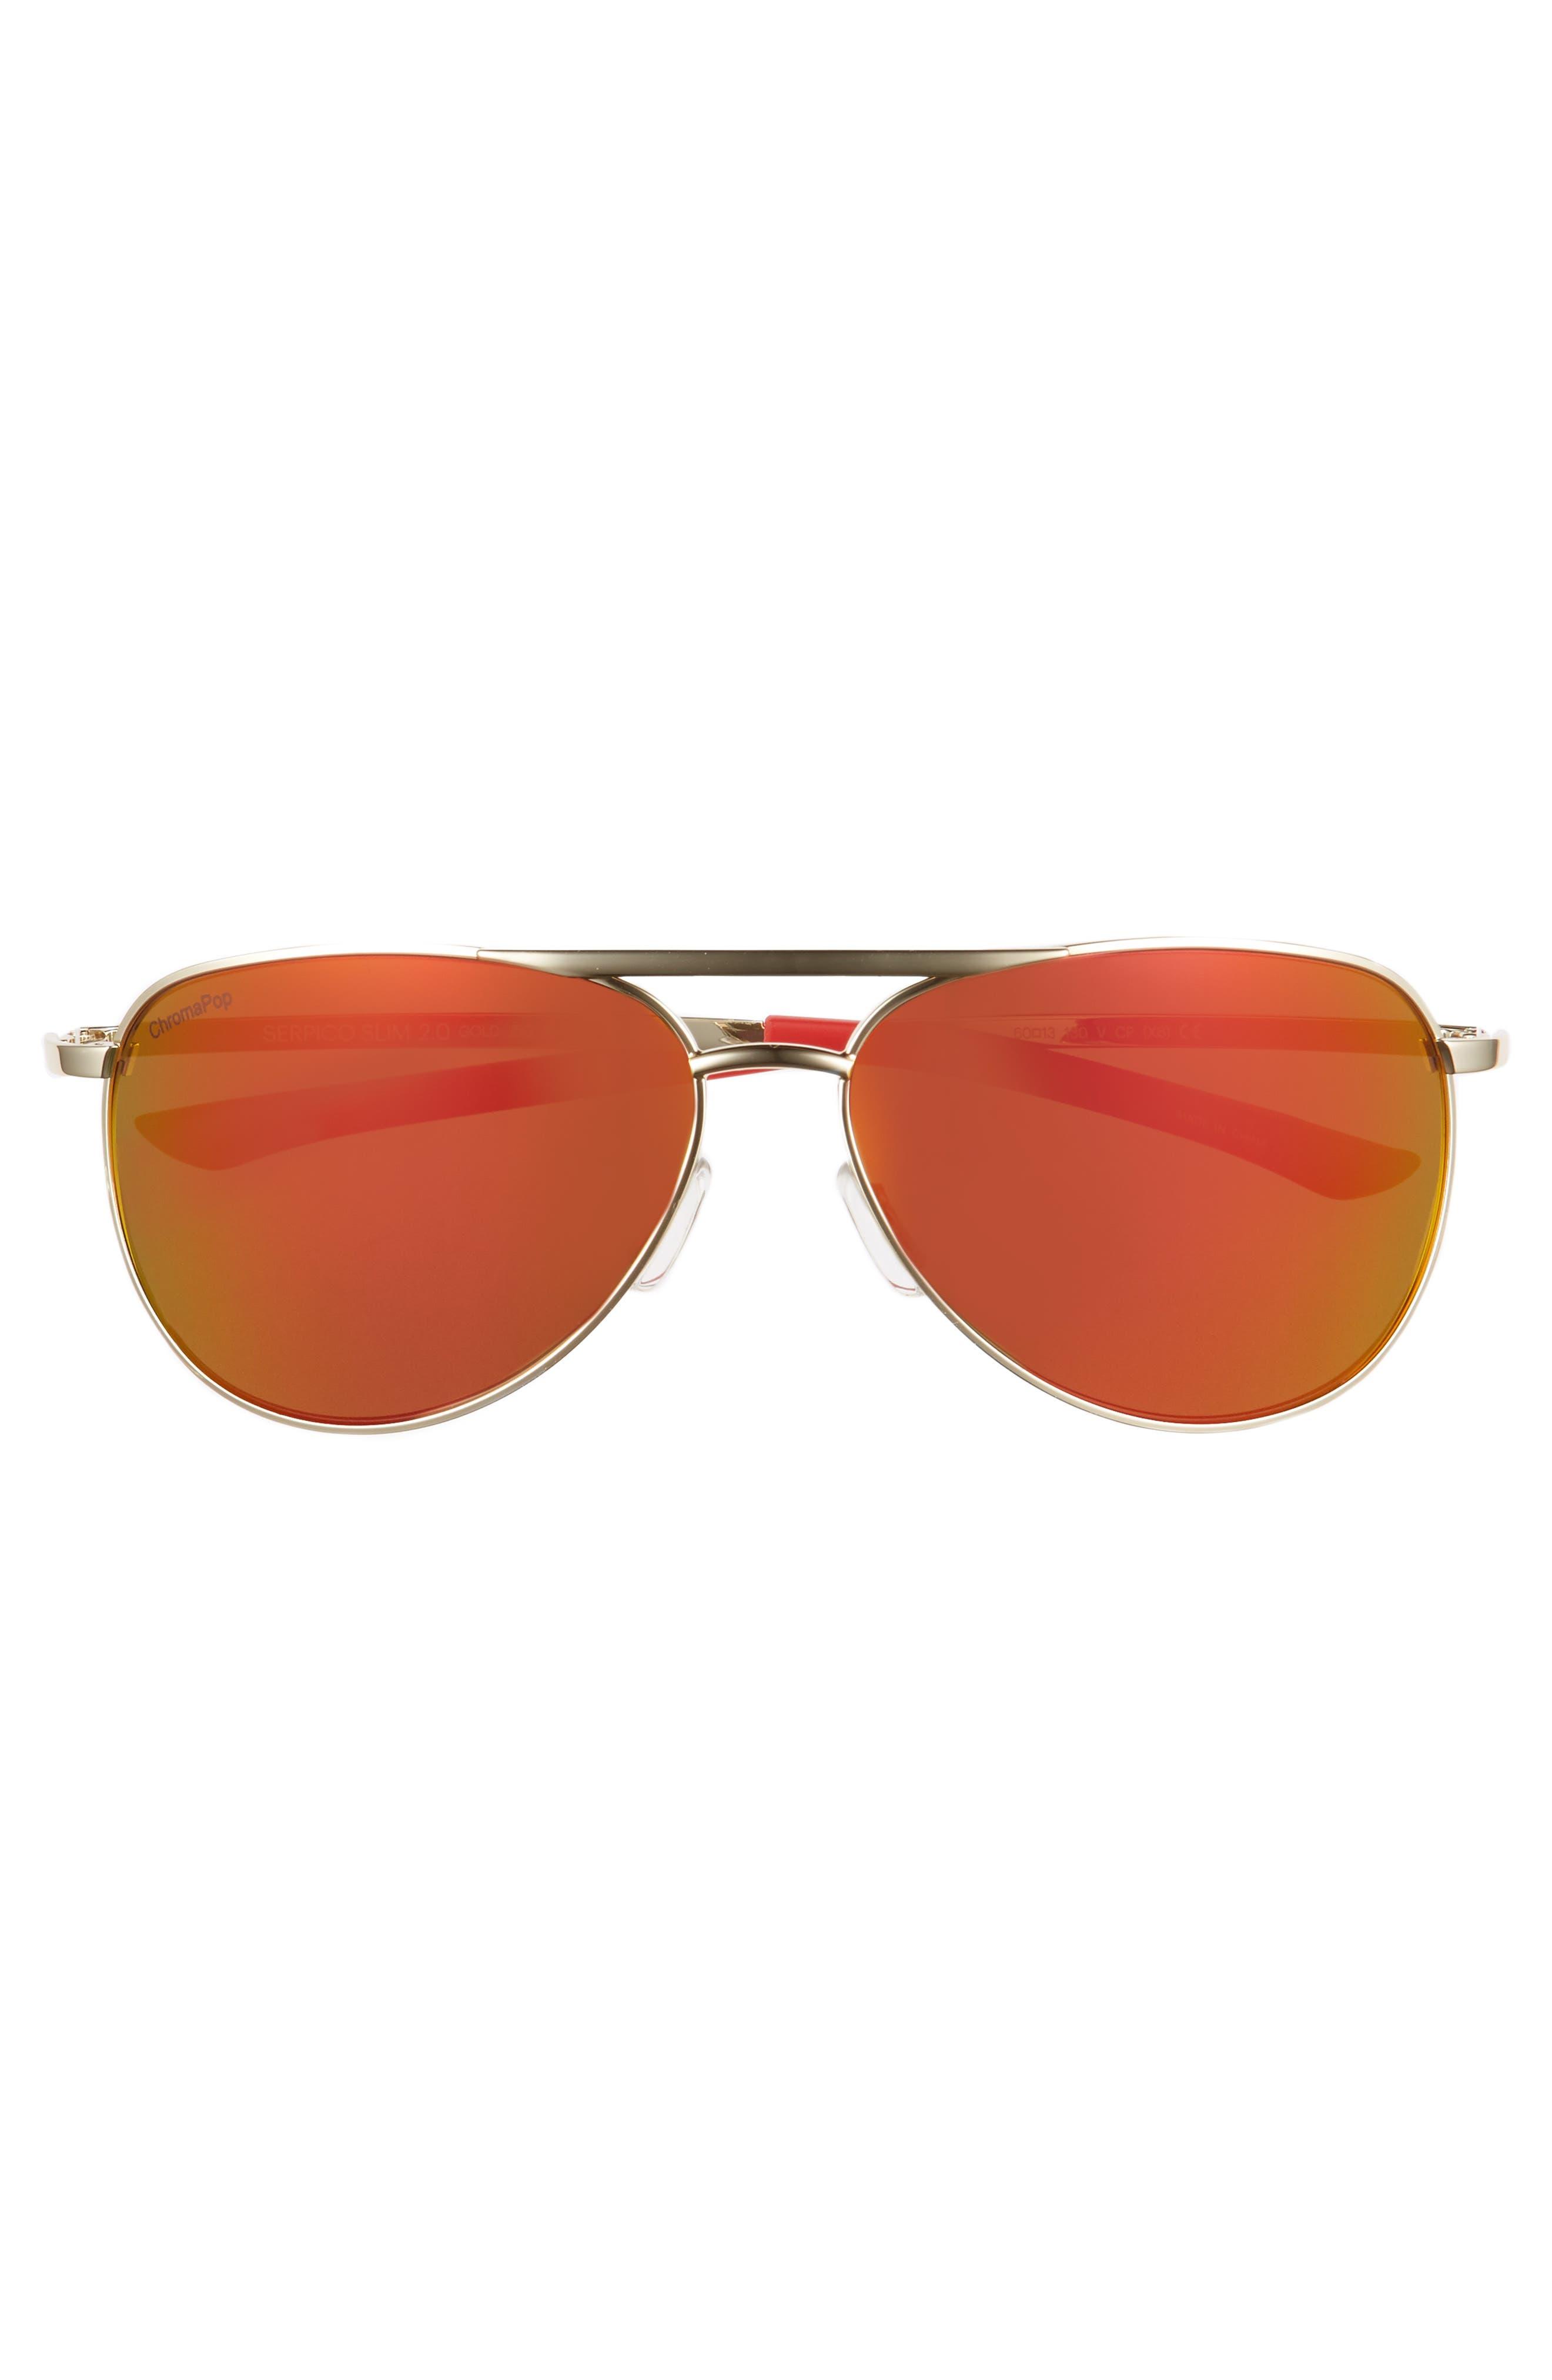 Serpico Slim 2.0 60mm ChromaPop Polarized Aviator Sunglasses,                             Alternate thumbnail 3, color,                             710